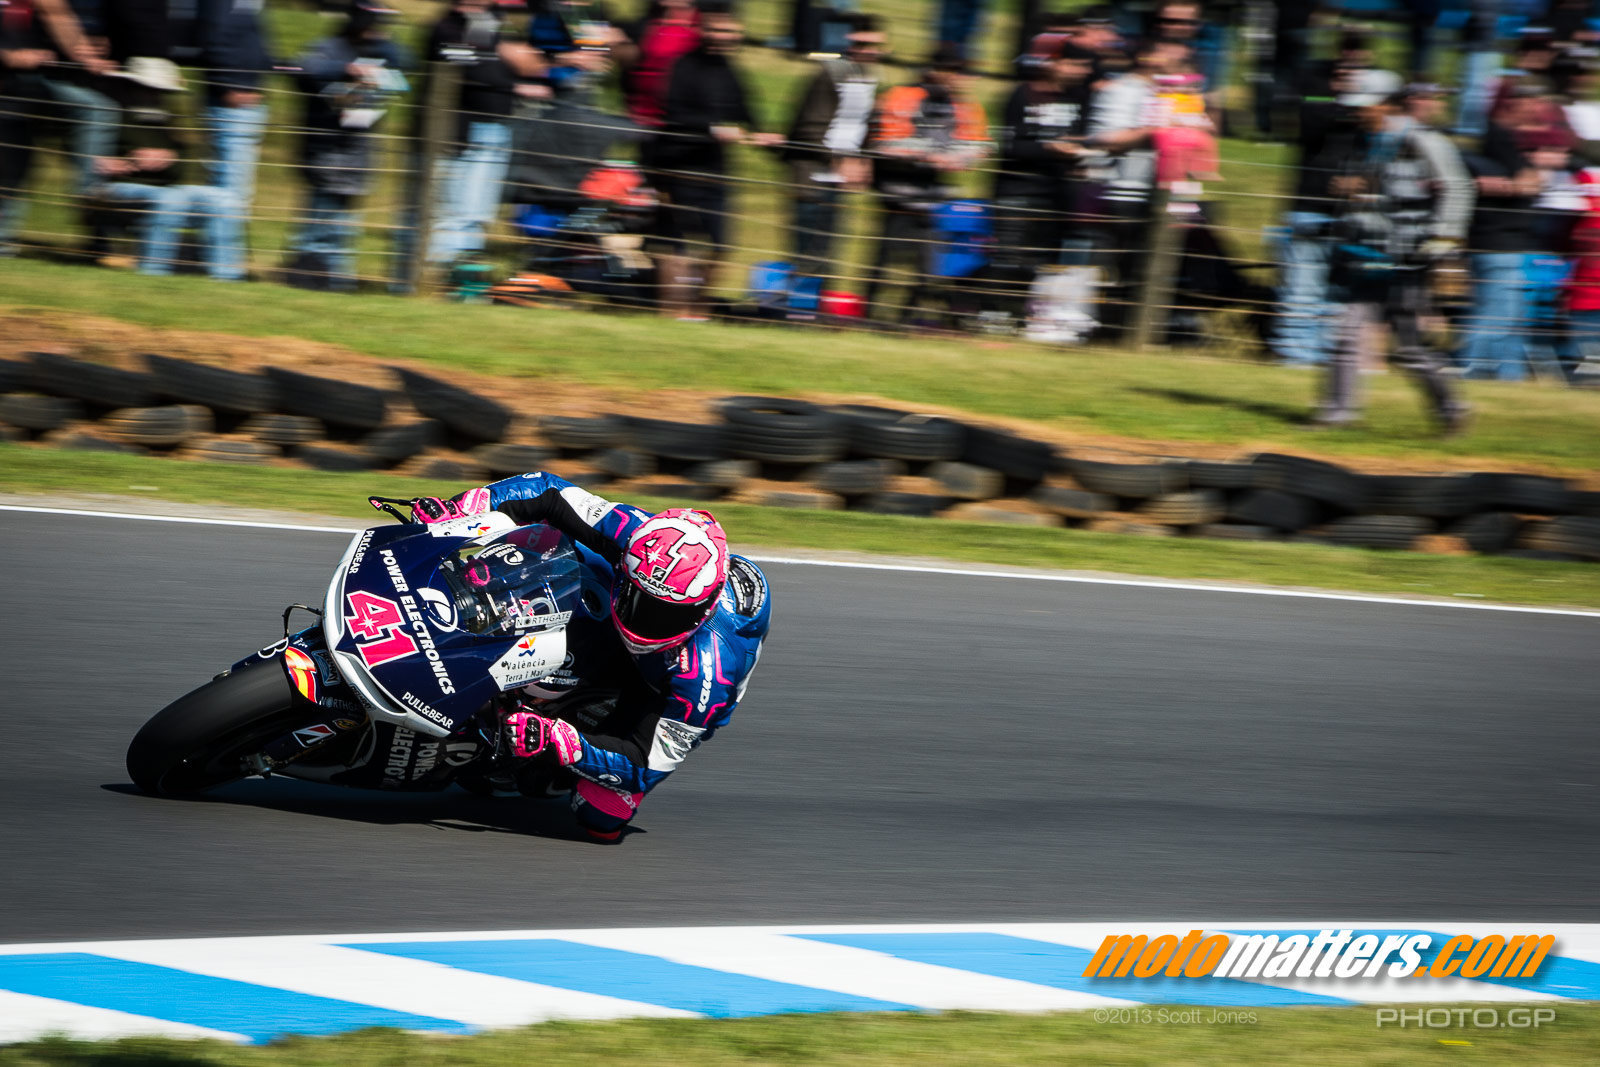 GP Phillip Island - Page 4 2013-MotoGP-16-Phillip-Island-Friday-1431-O